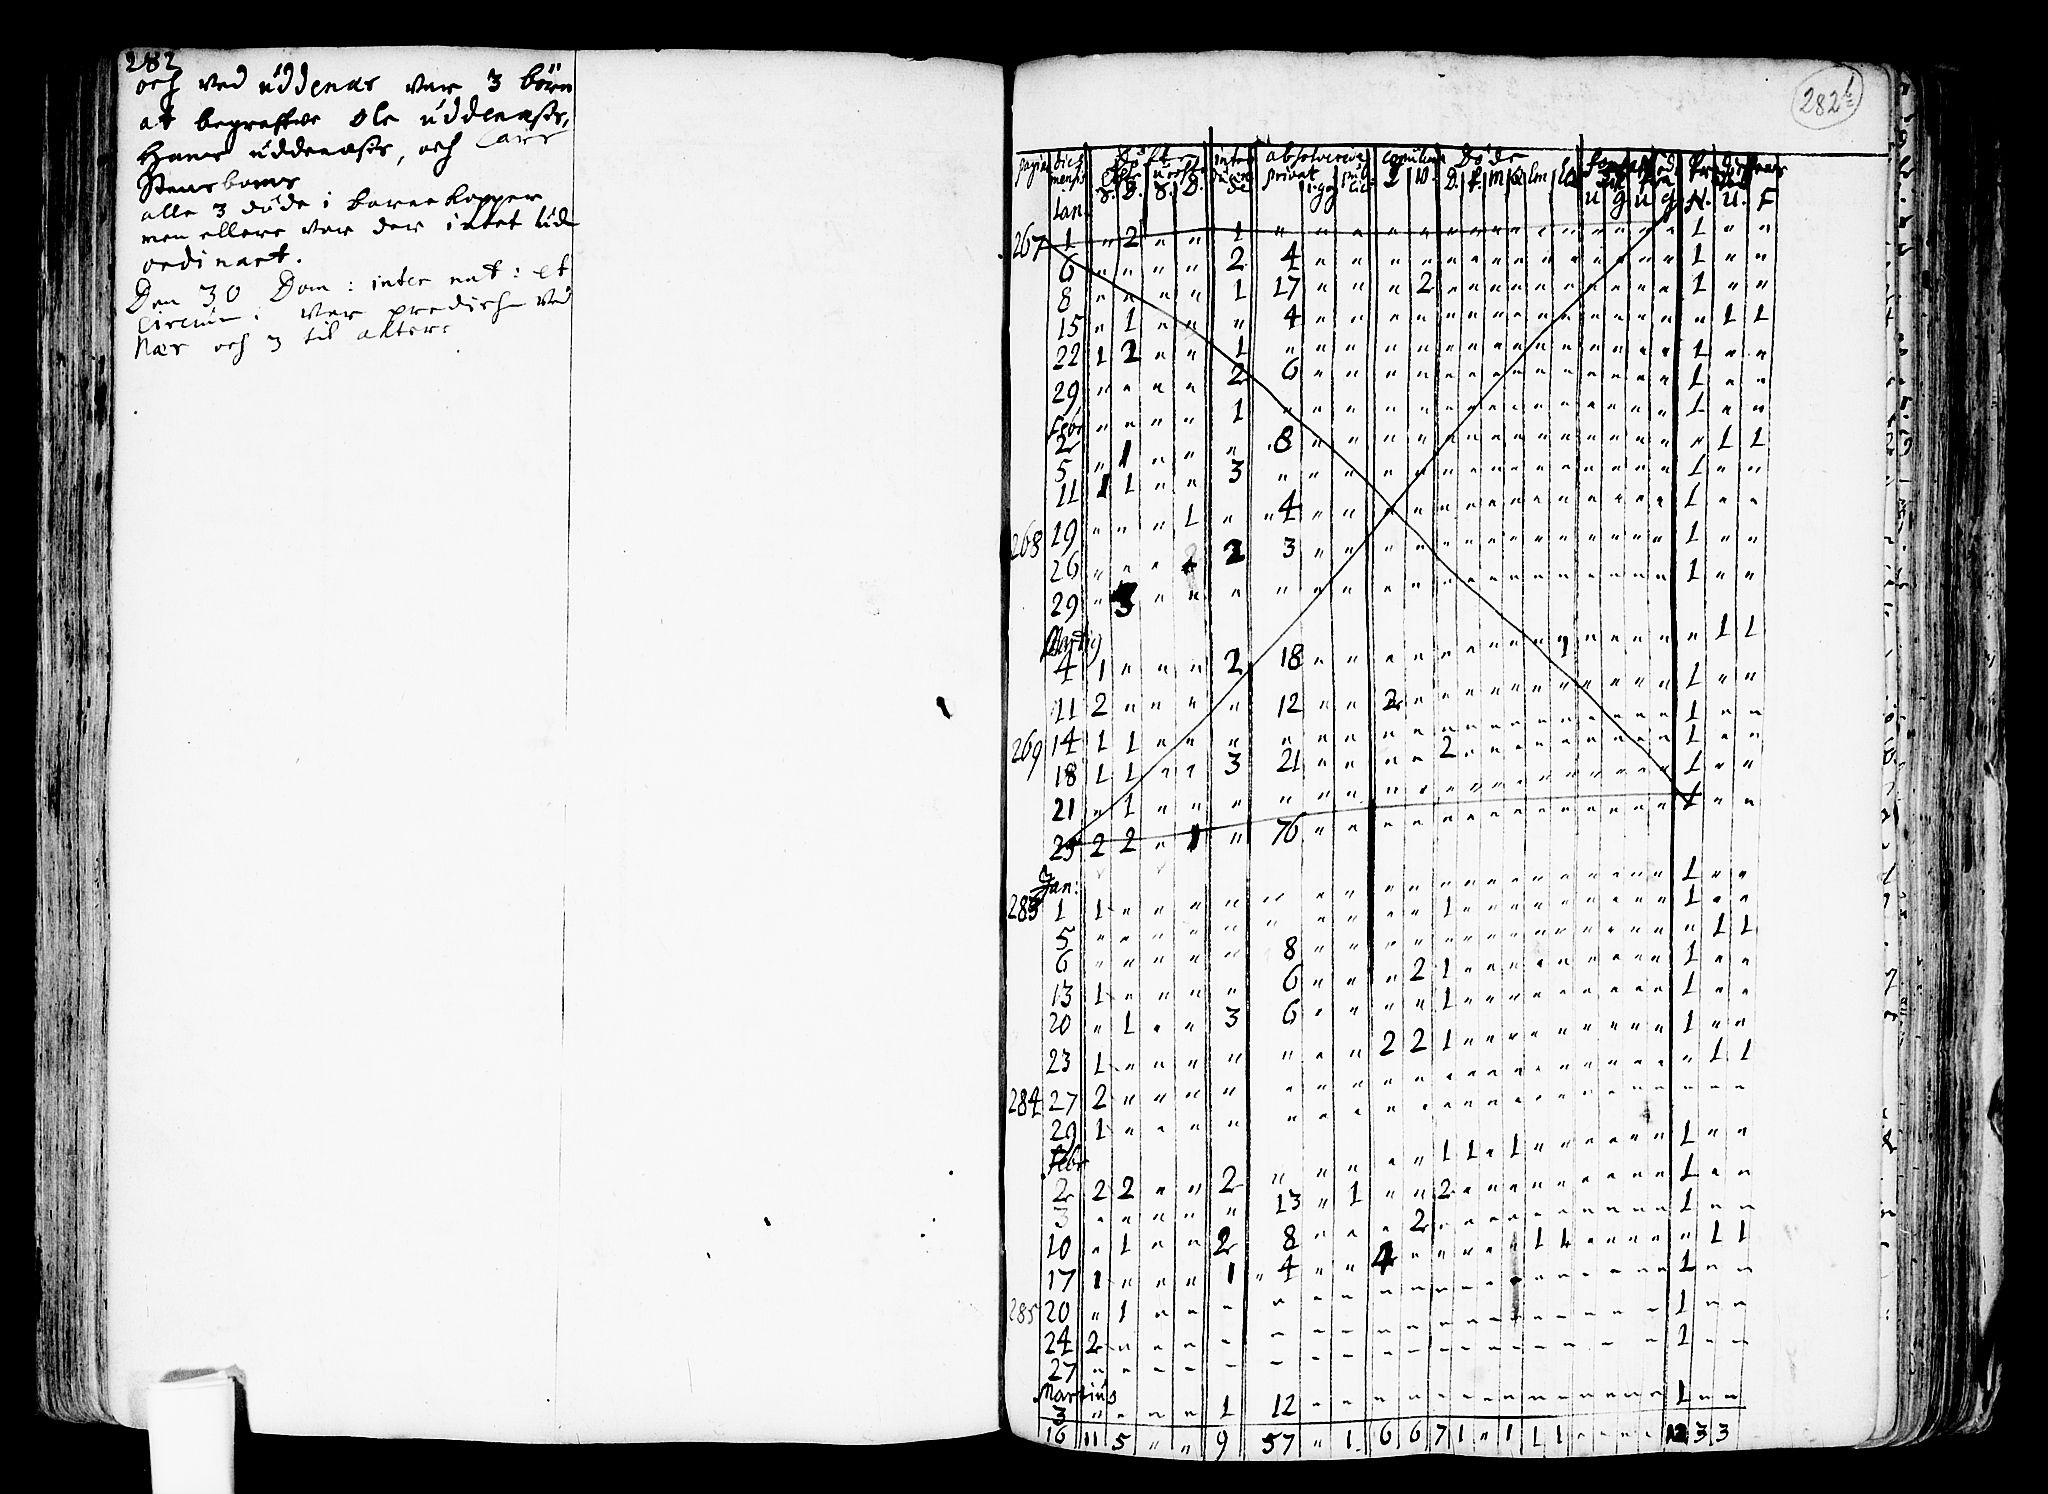 SAO, Nes prestekontor Kirkebøker, F/Fa/L0001: Parish register (official) no. I 1, 1689-1716, p. 282a-282b